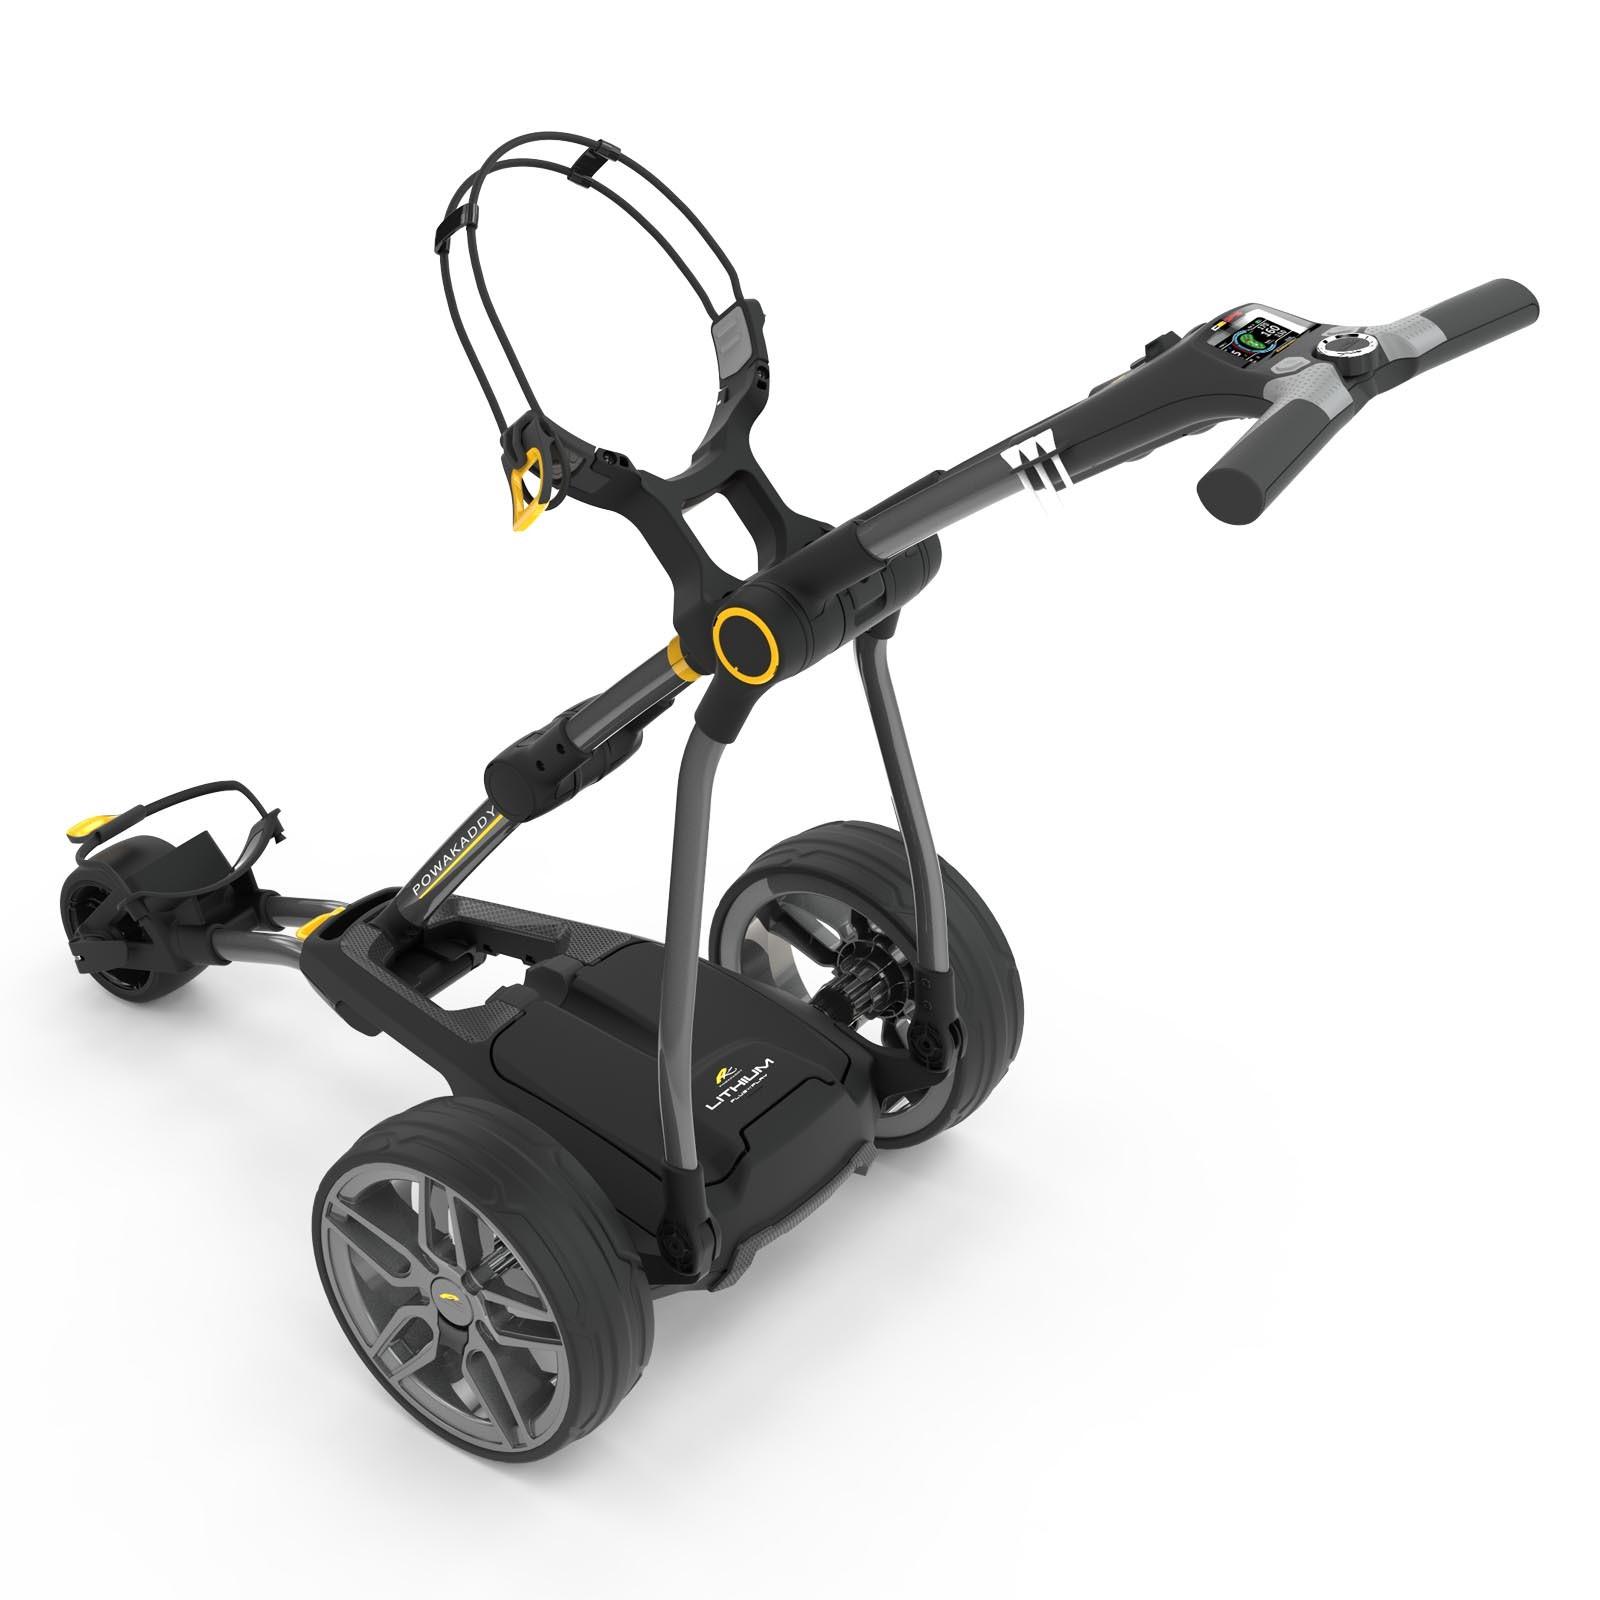 Powakaddy Compact C2i GPS Golf Trolley (18 Hole Lithium Battery)